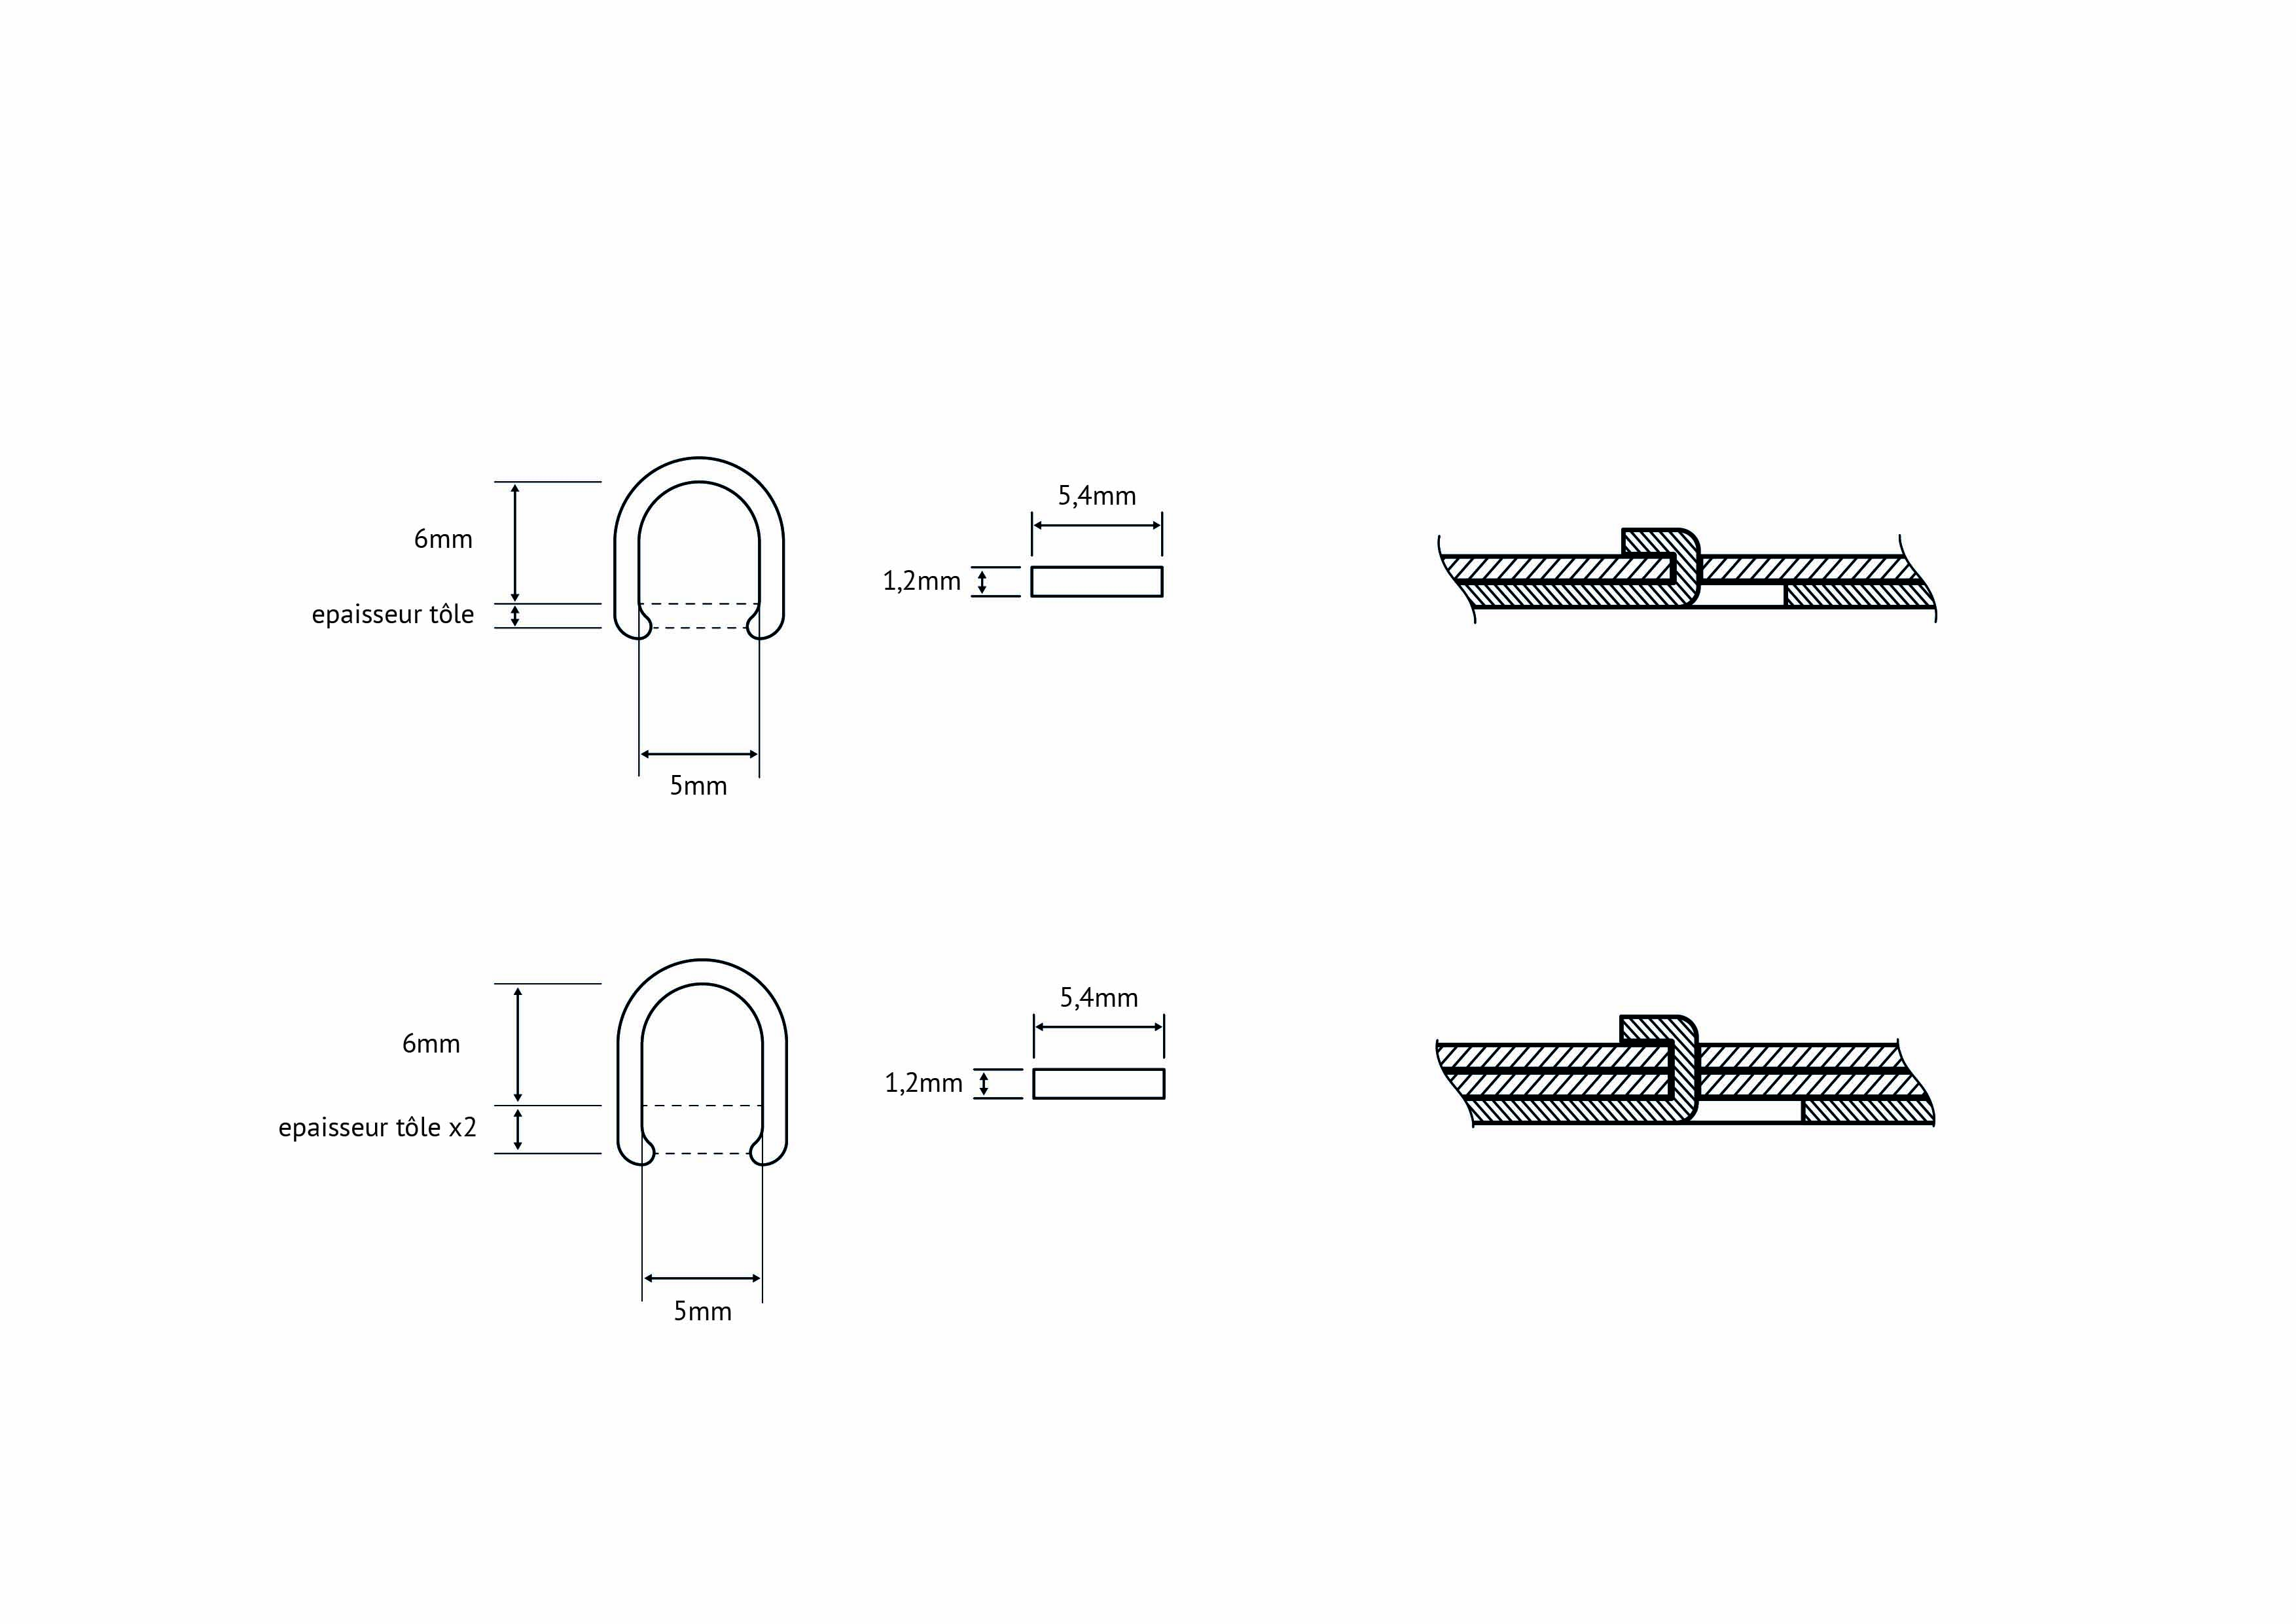 laser cut metal fastening dimensional drawing